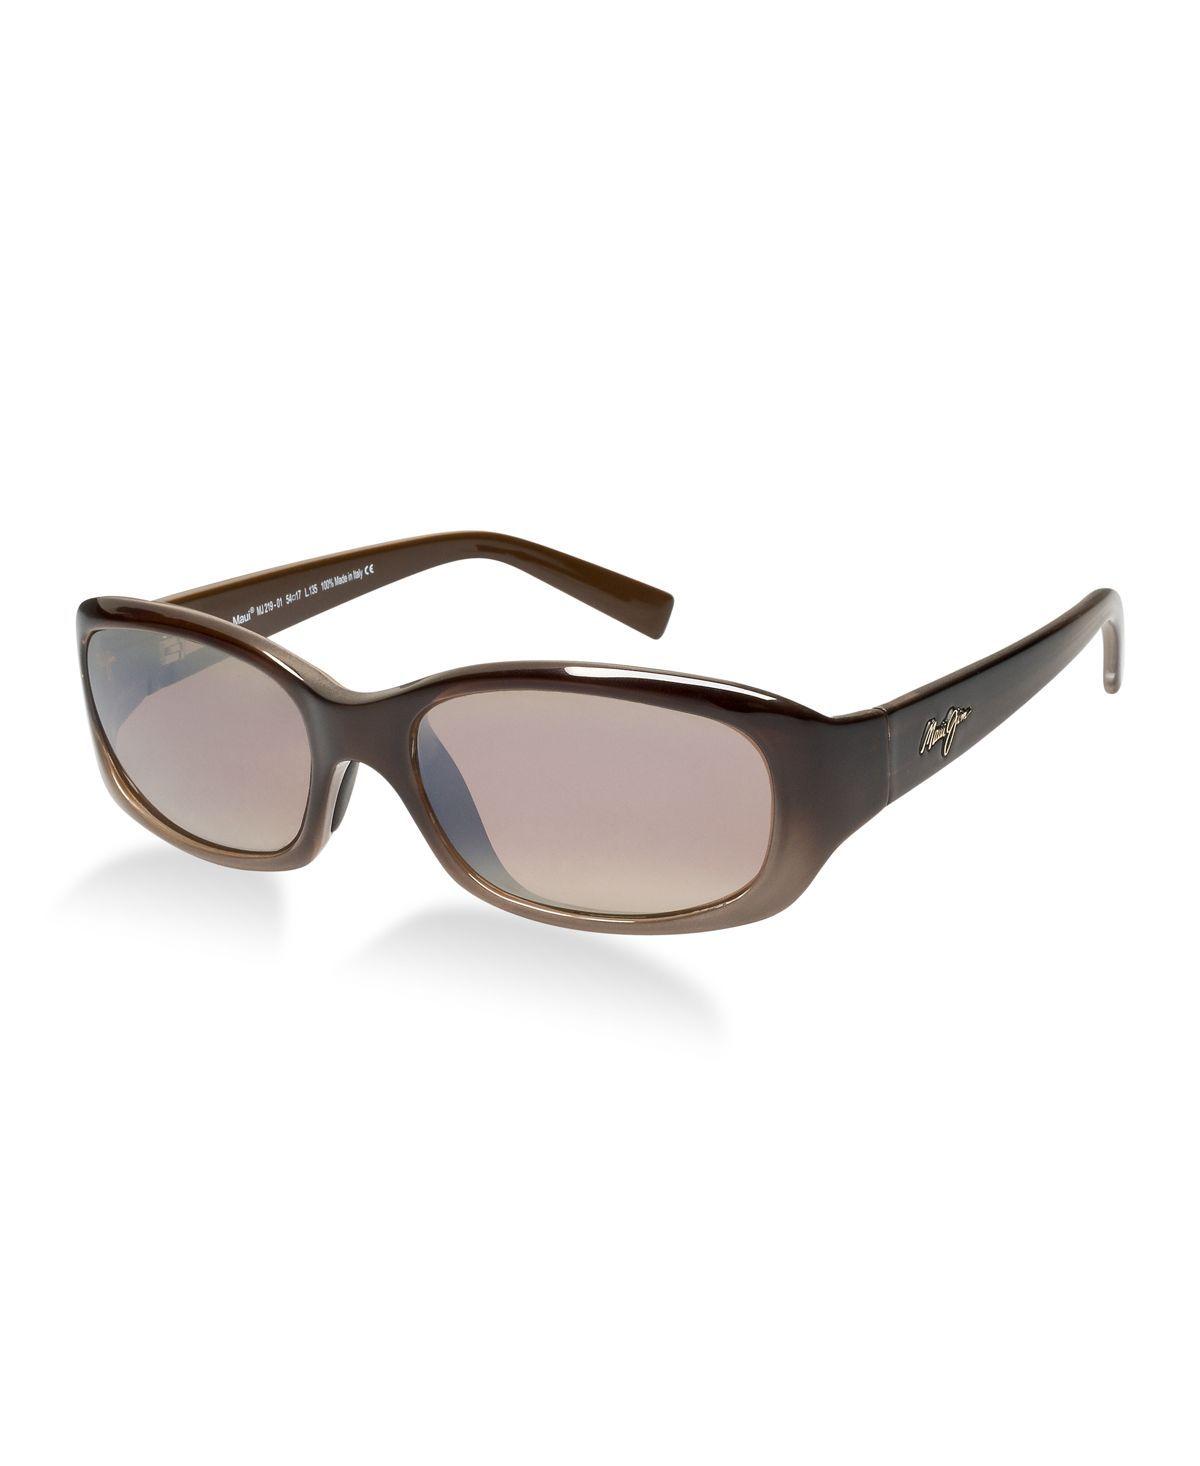 78386fede741 Polarized Punchbowl Sunglasses, 219 | Products | Maui jim sunglasses ...